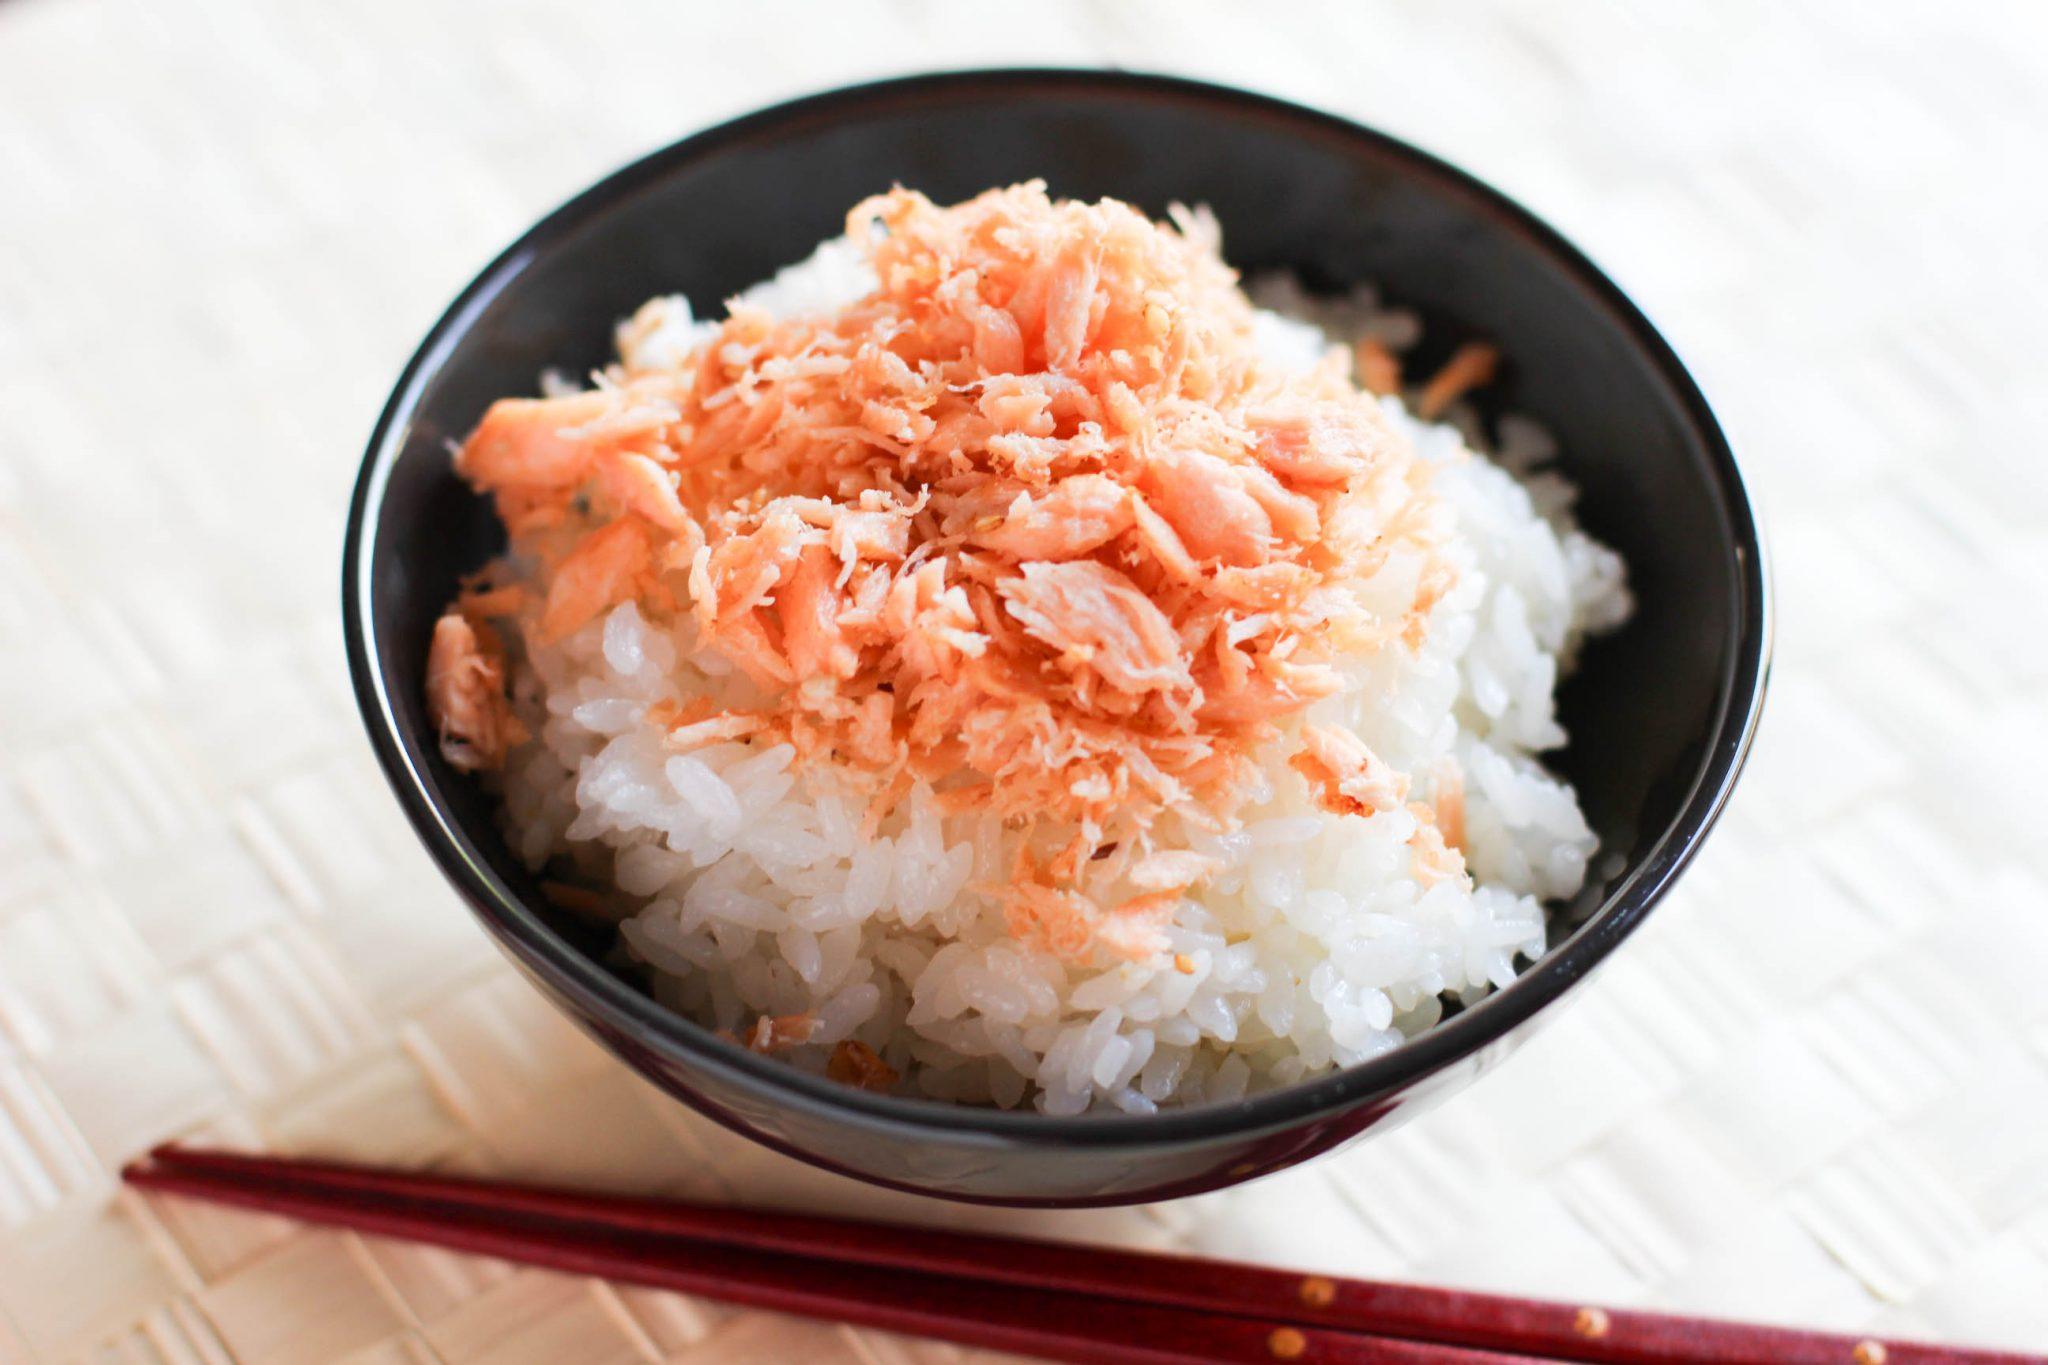 Salmon Flakes Recipe Japanese Cooking 101 Watermelon Wallpaper Rainbow Find Free HD for Desktop [freshlhys.tk]